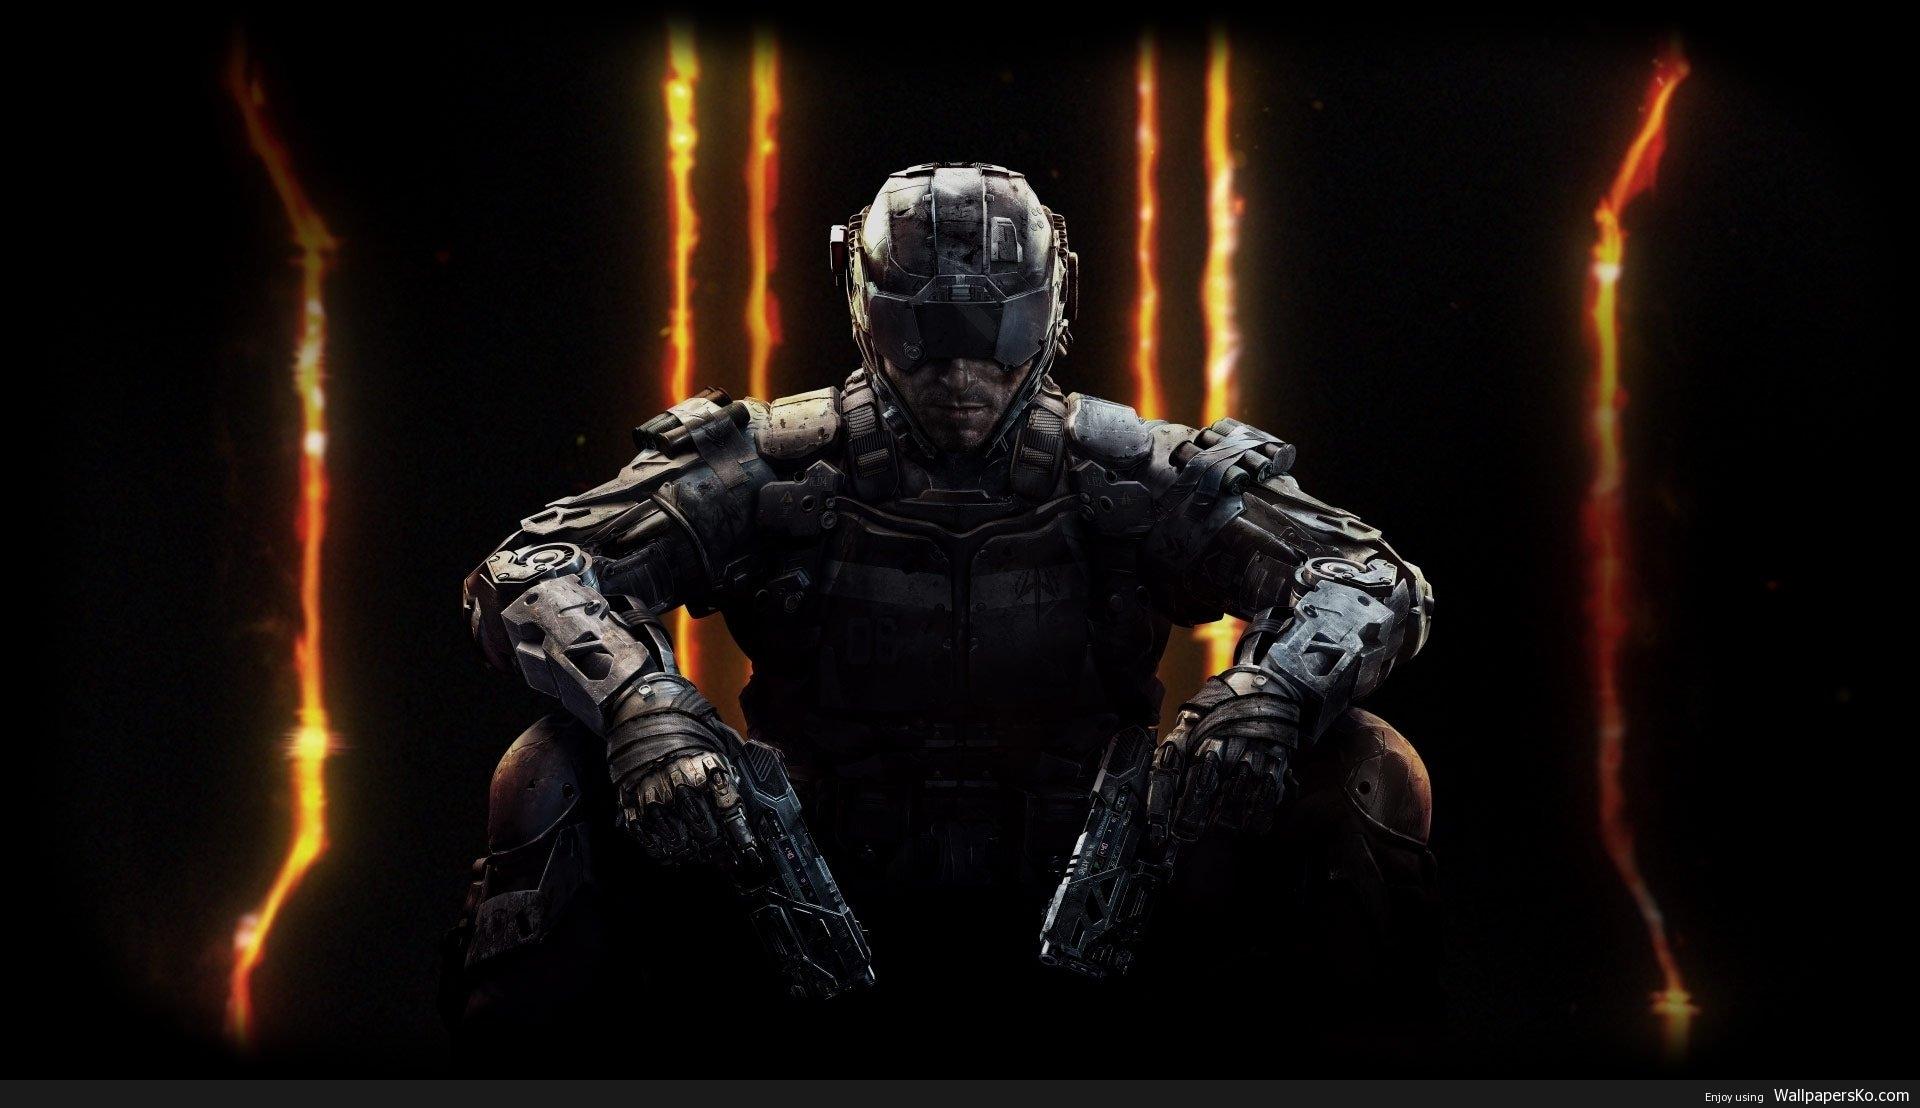 Black Ops 3 Background